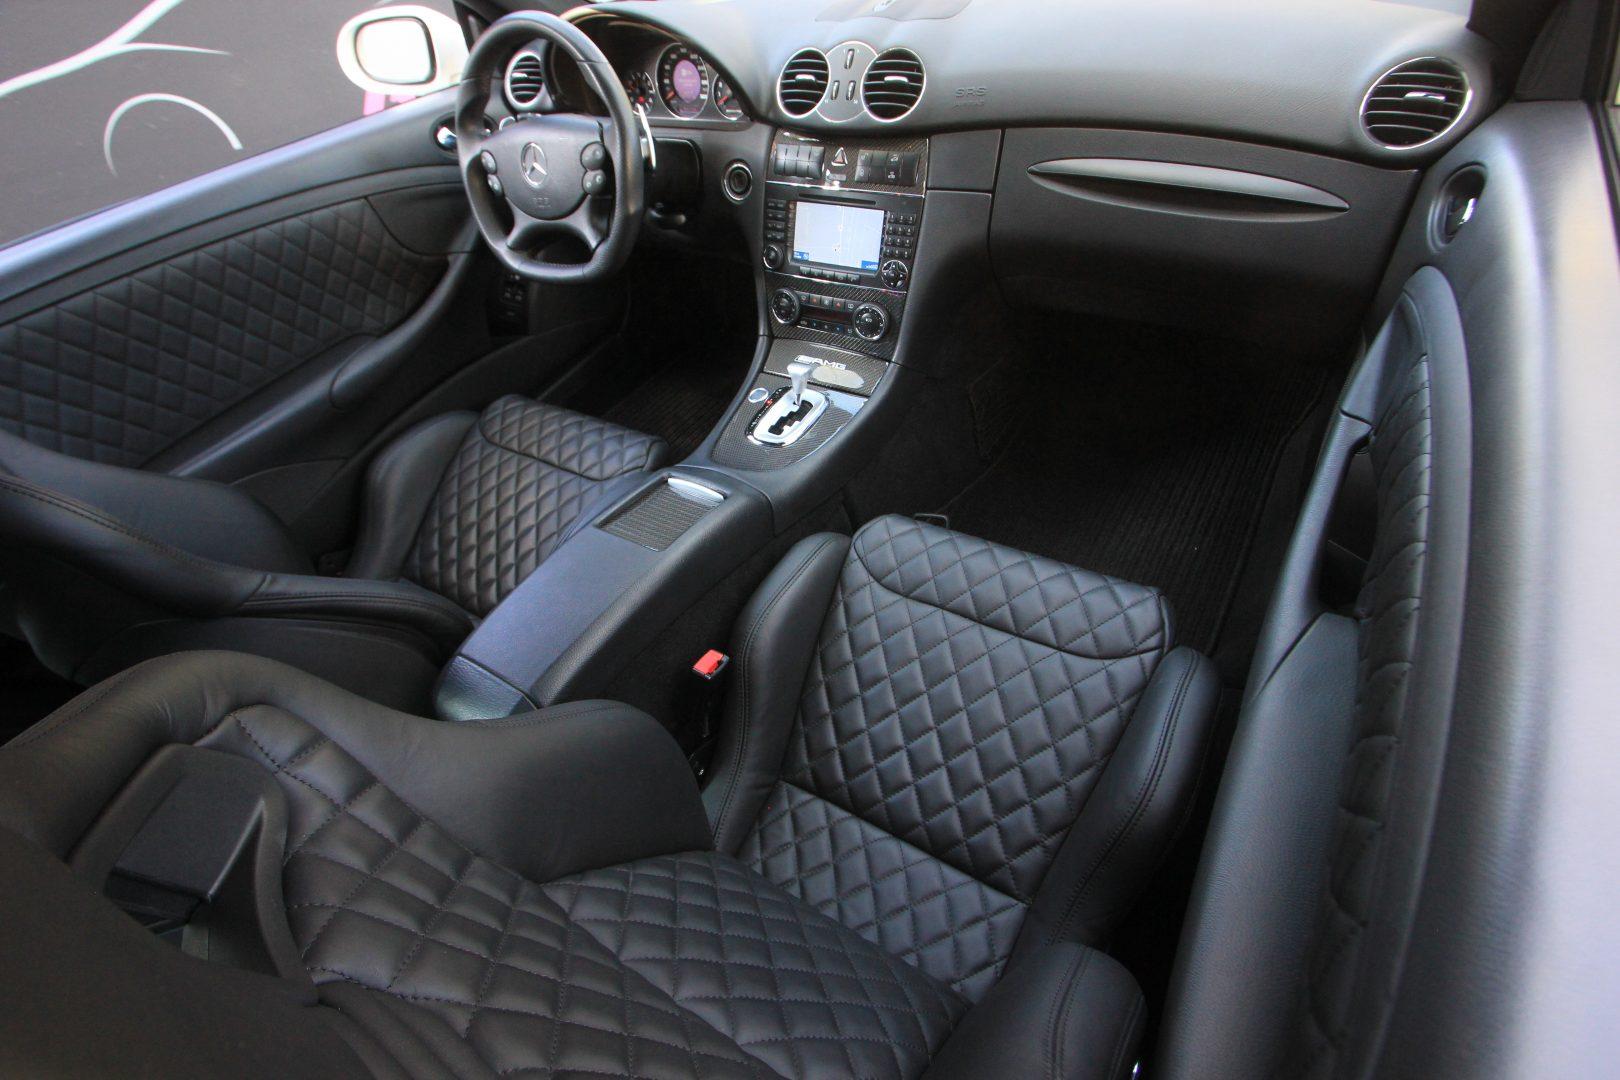 AIL Mercedes-Benz CLK 63 AMG Black Series 9